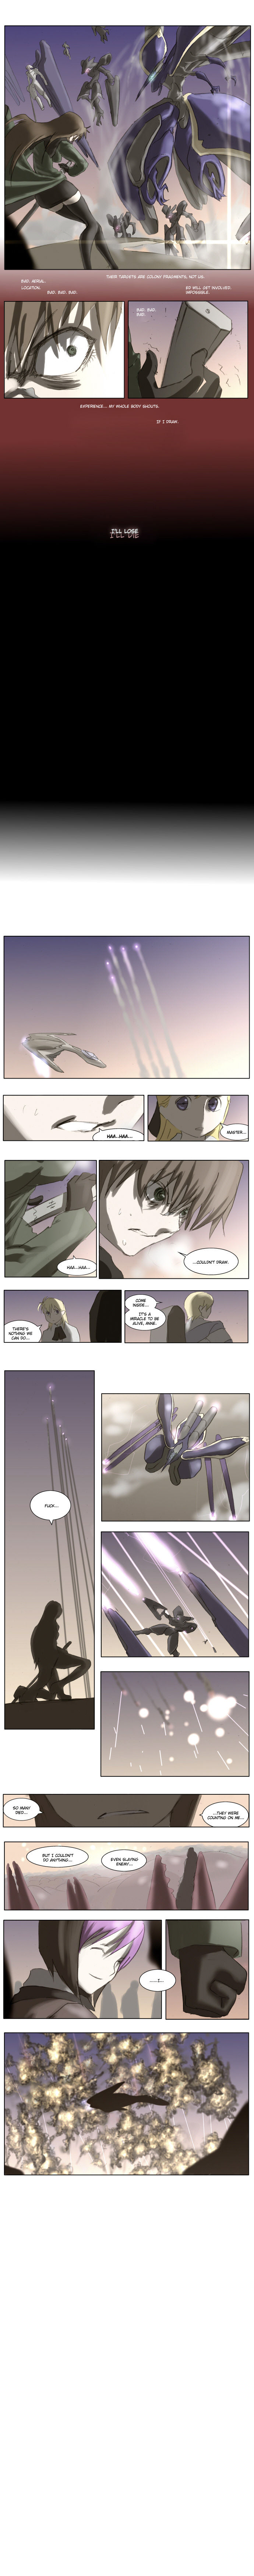 Knight Run 41 Page 2